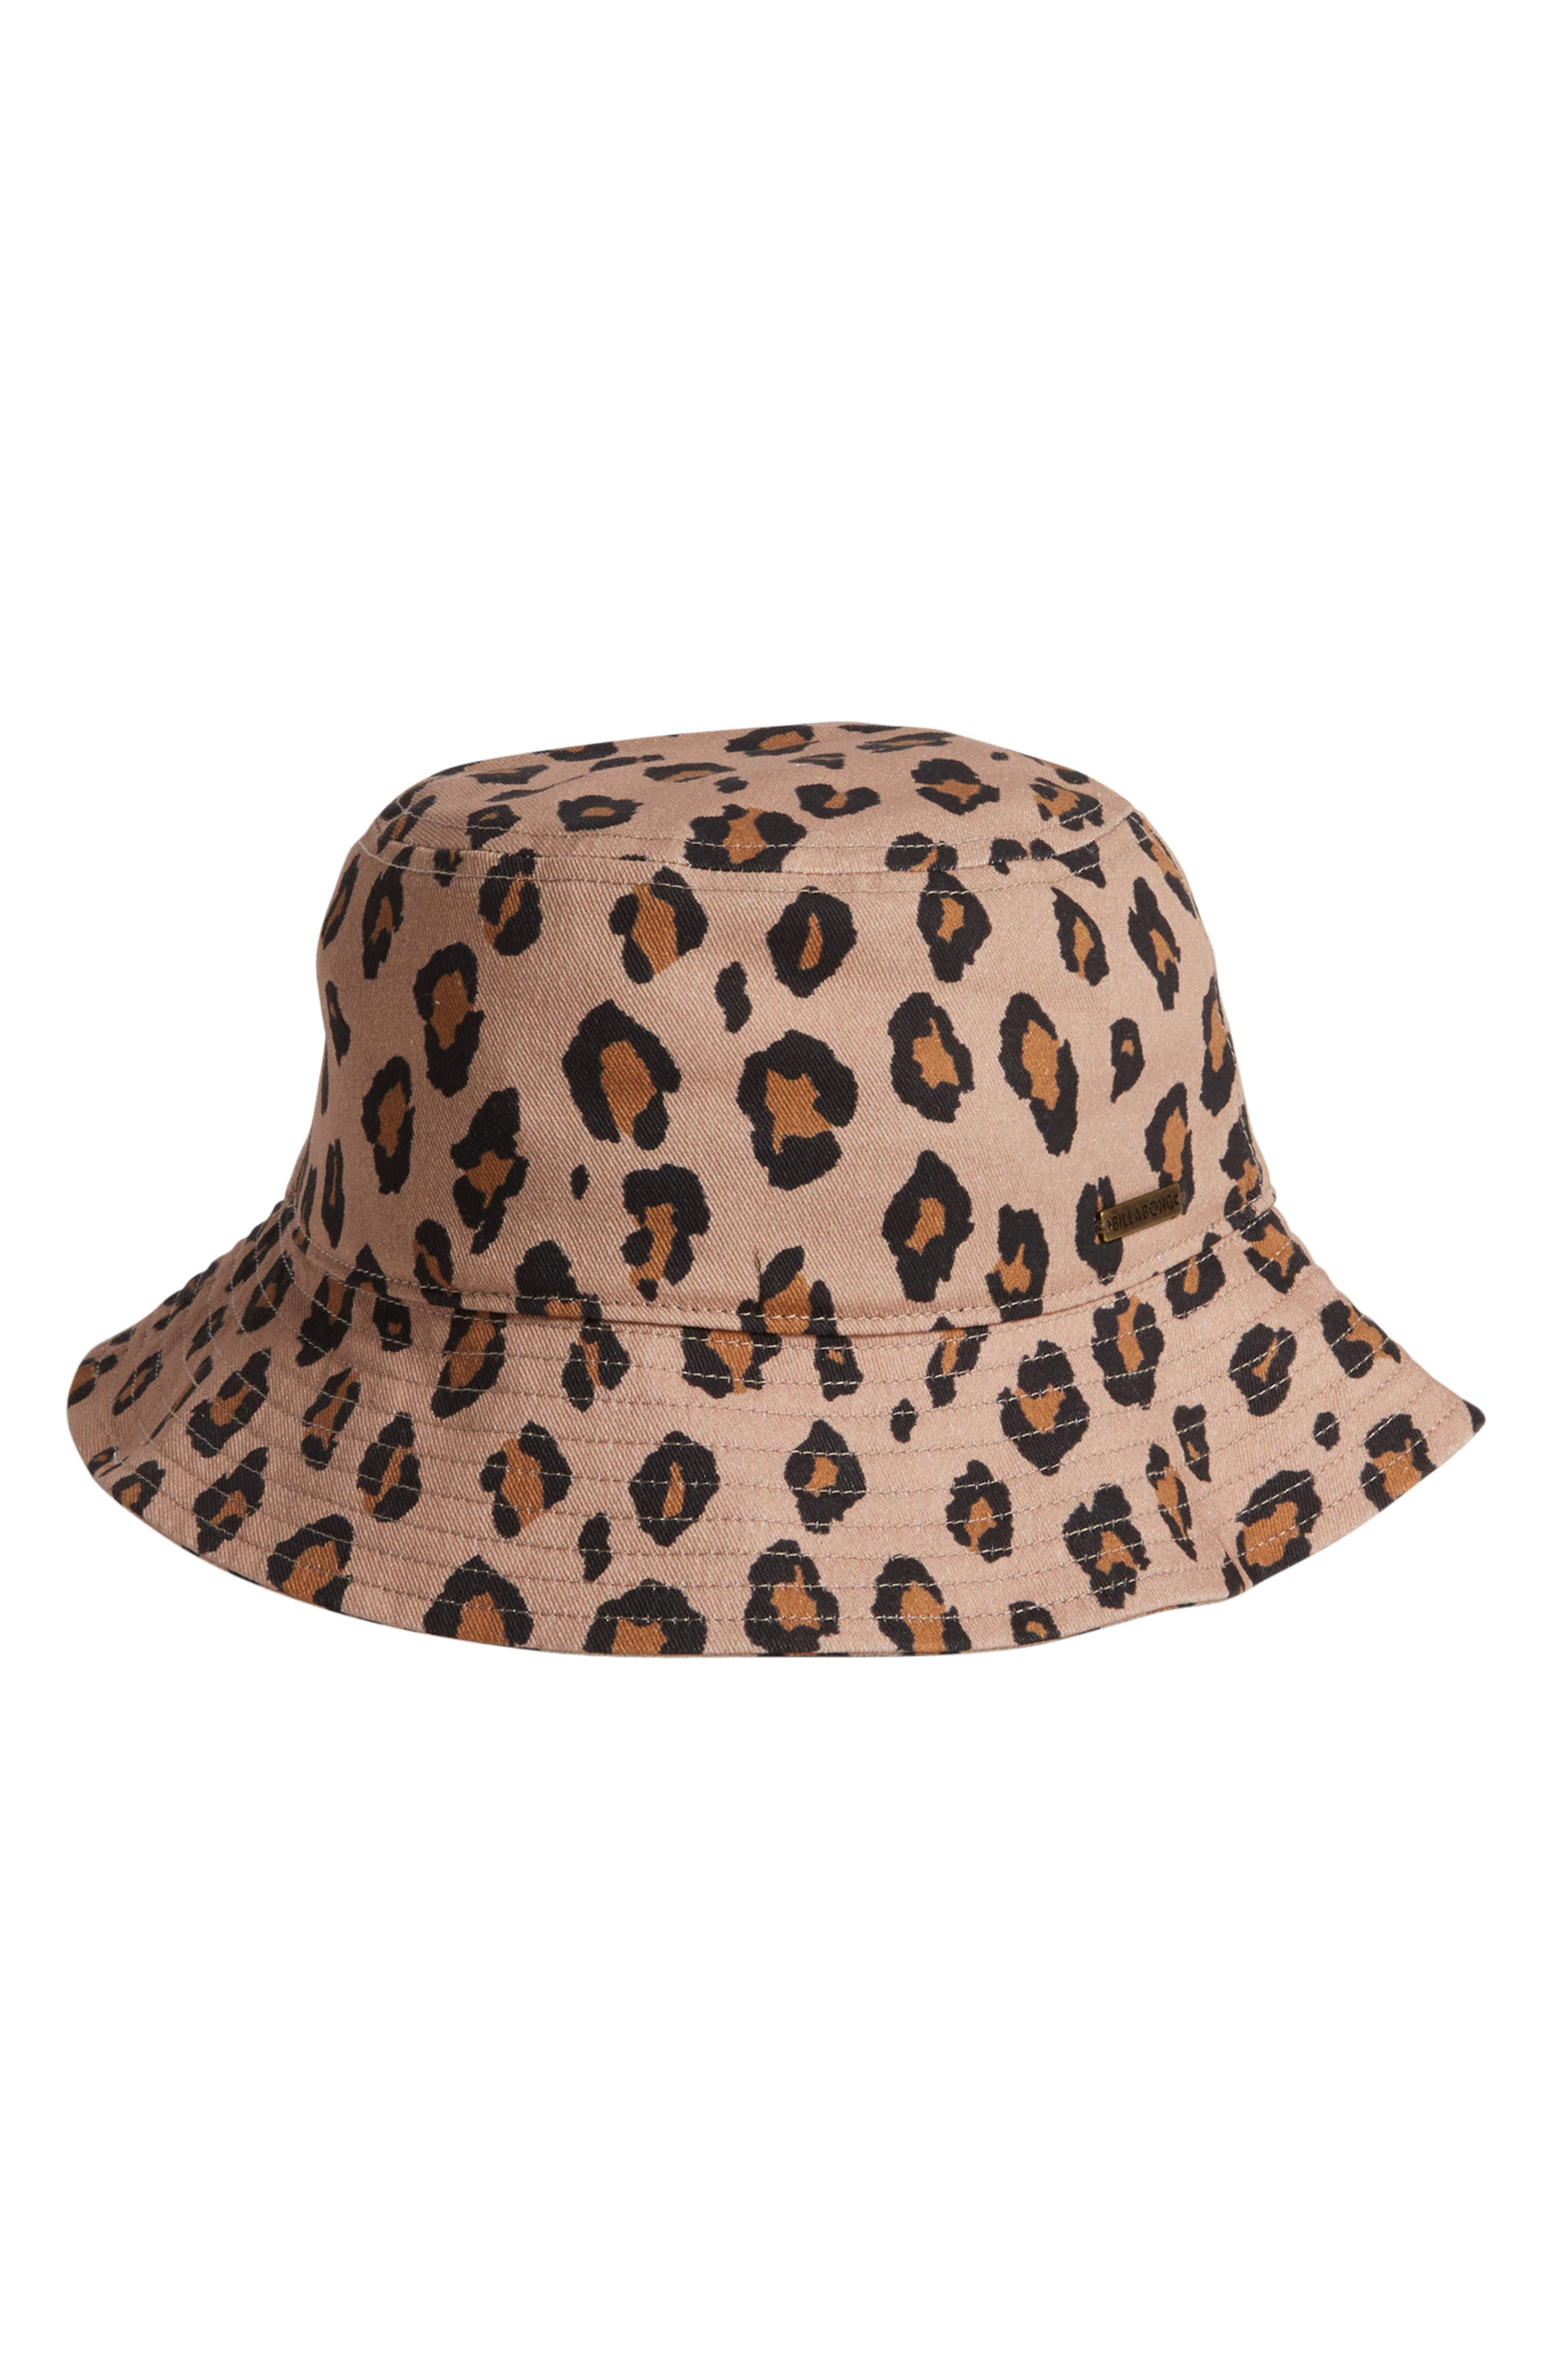 80s Hats, Caps, Visors, Buckets | Women and Men Womens Billabong Still Single Washed Bucket Hat - $19.77 AT vintagedancer.com